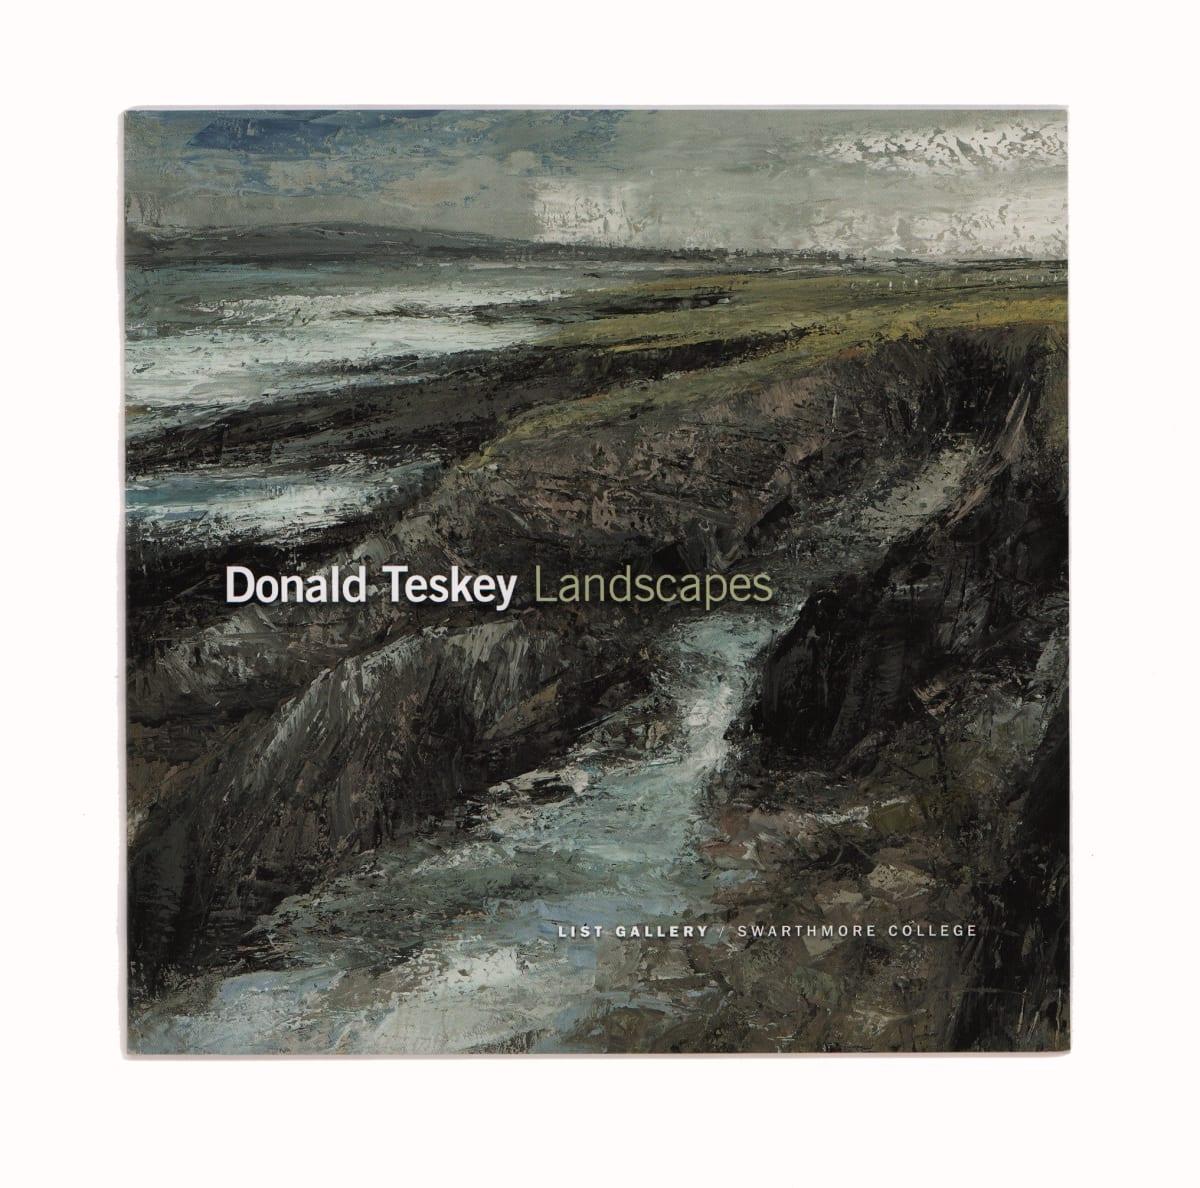 Donald Teskey